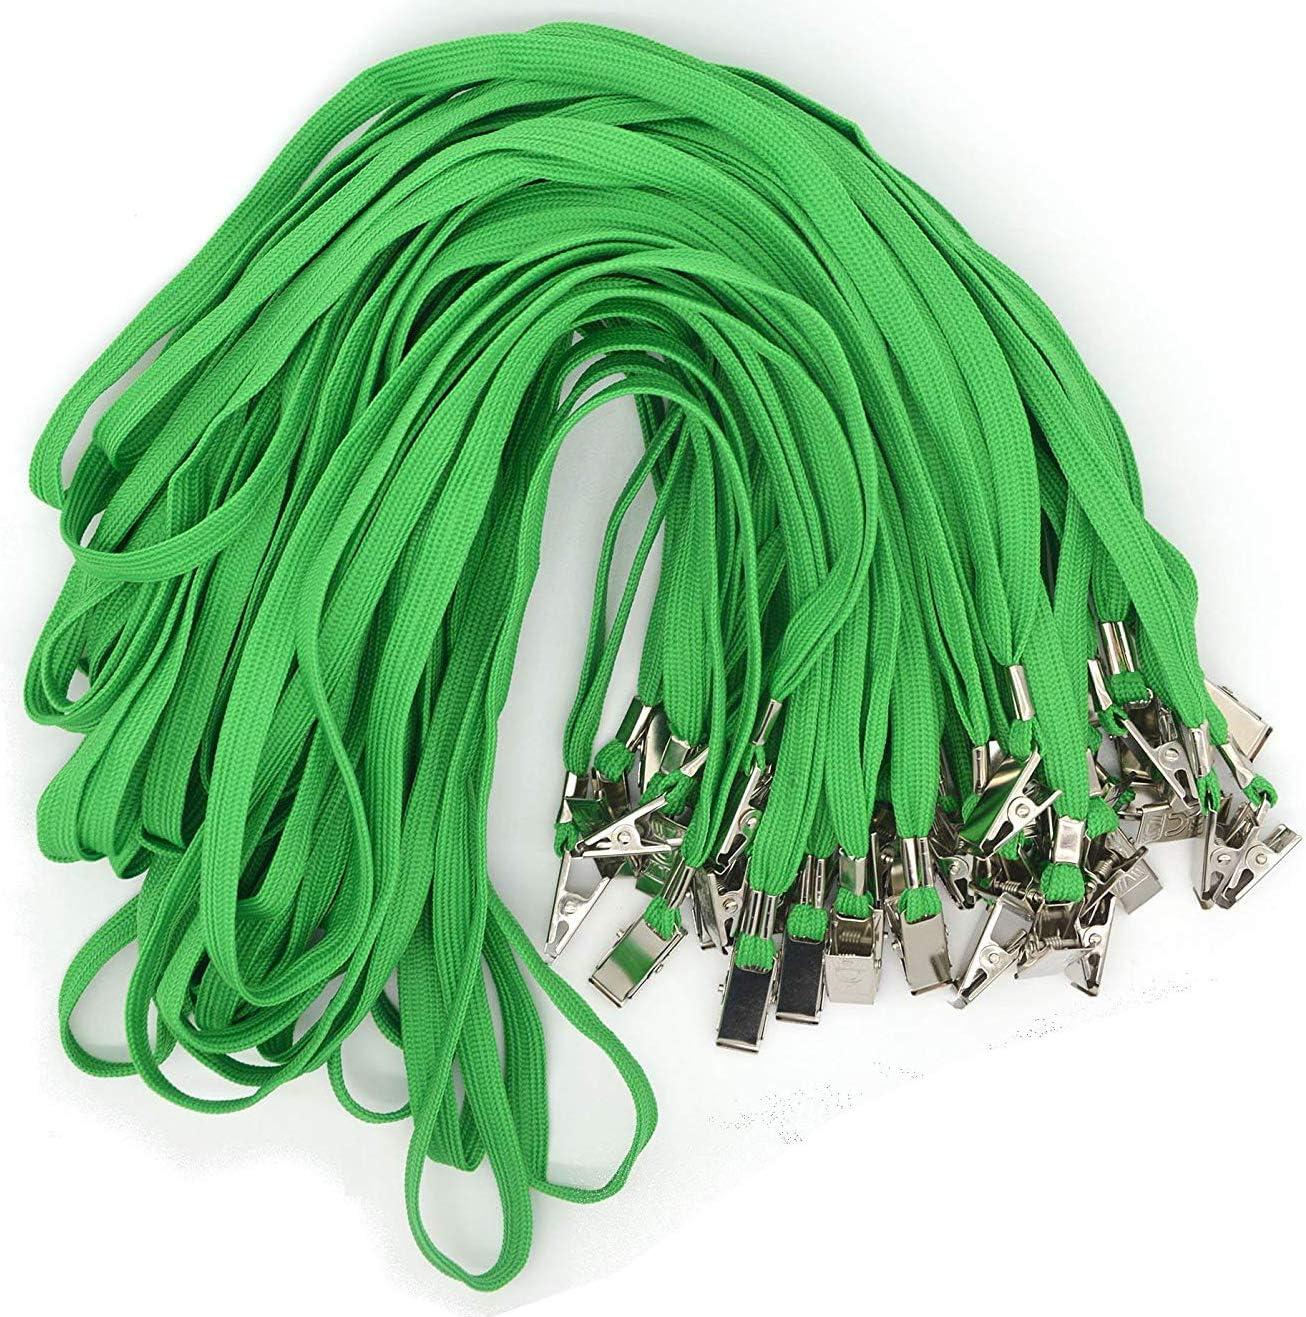 Bird Fiy 50 Pcs Cotton Lanyard Bulldog Clip 32-inch Flat Braid Neck Lanyard for Id Cards/Badges (Green)